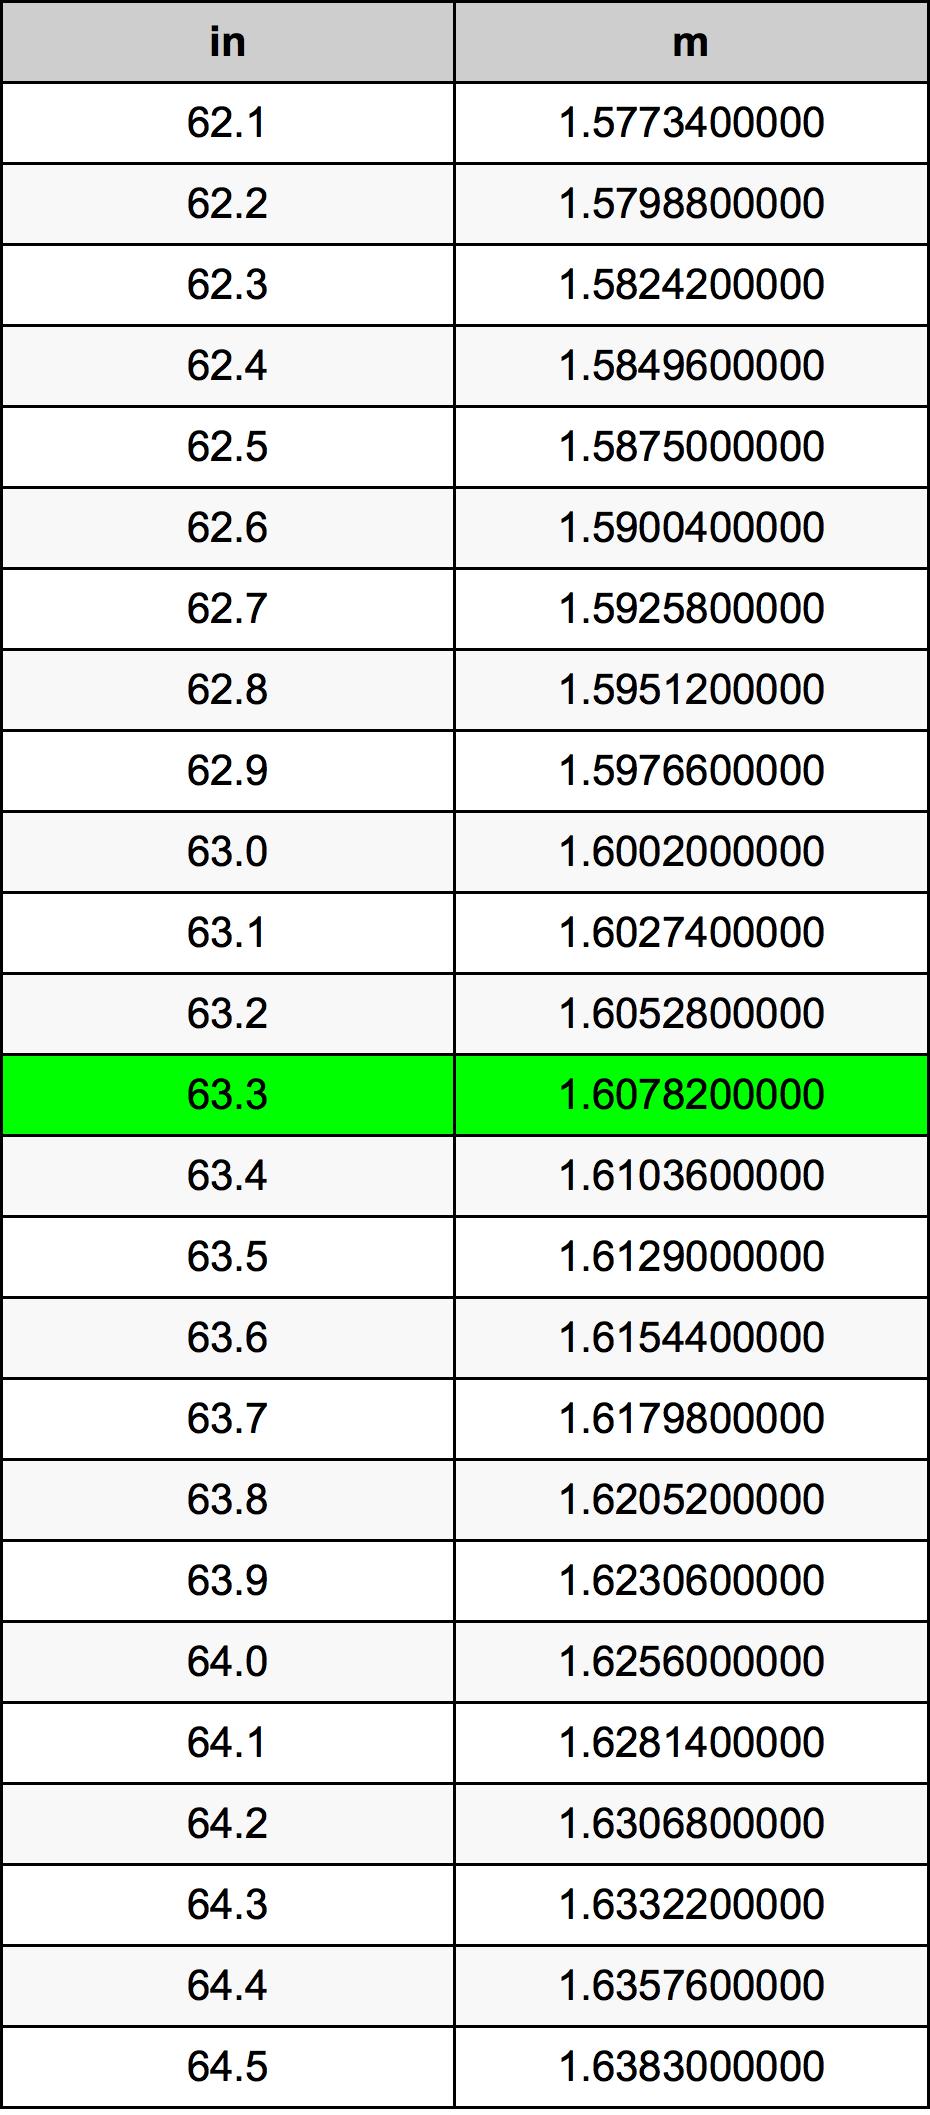 63.3 дюйм Таблица преобразования